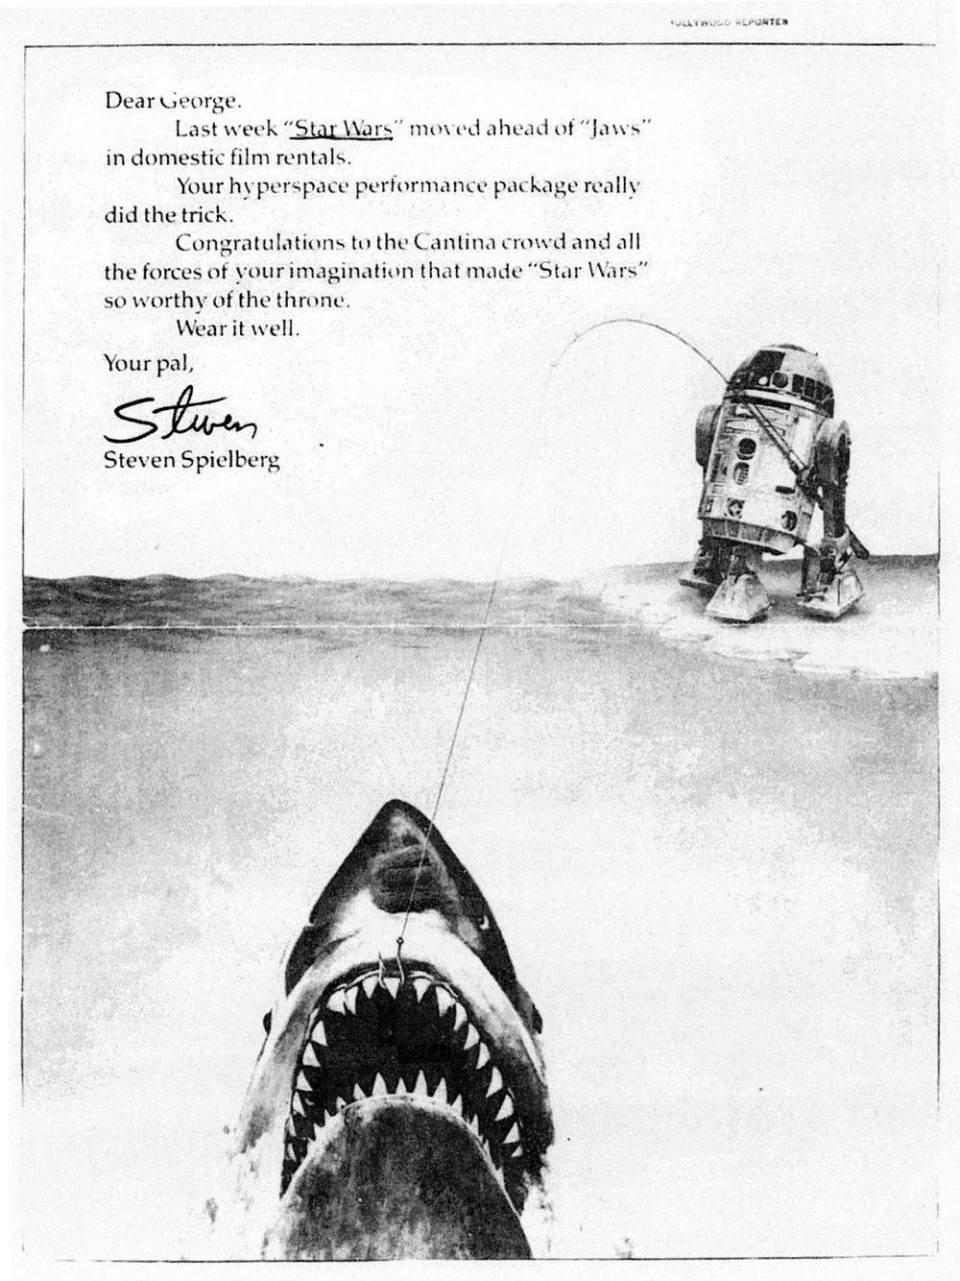 Original 1975 STAR WARS Casting Announcement